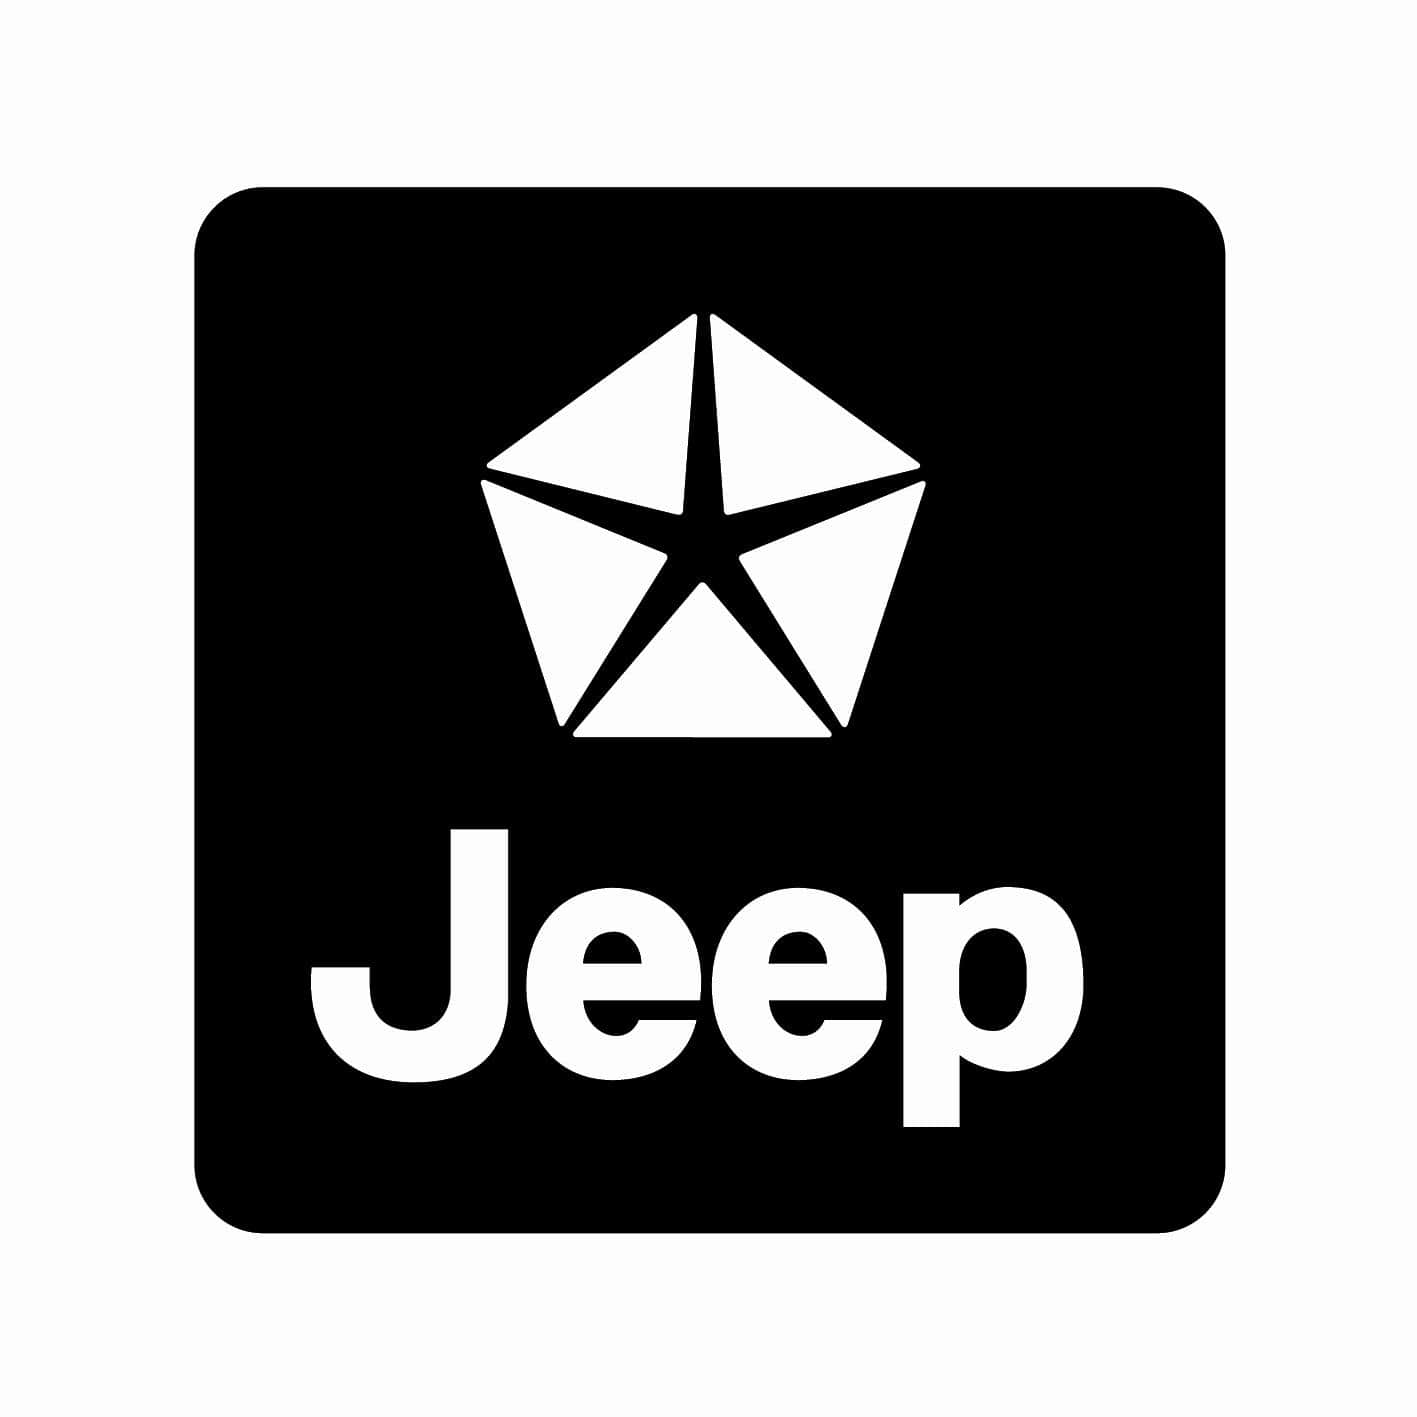 jeep-ref4-stickers-sticker-autocollant-4x4-tuning-audio-4x4-tout-terrain-car-auto-moto-camion-competition-deco-rallye-racing-min